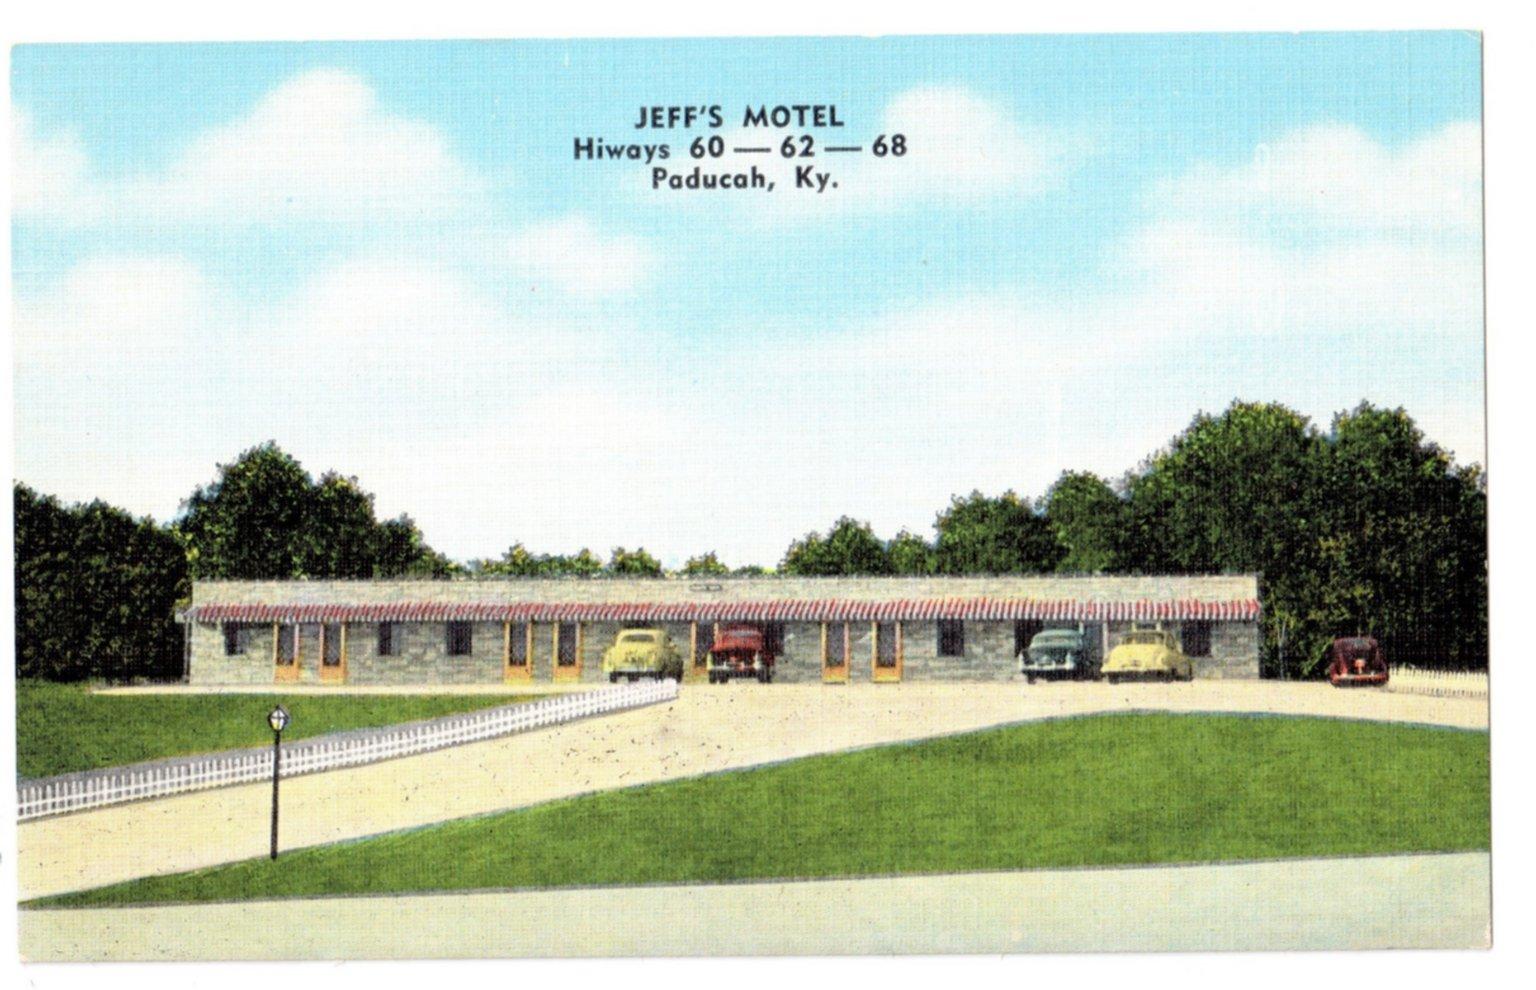 Jeff's Motel